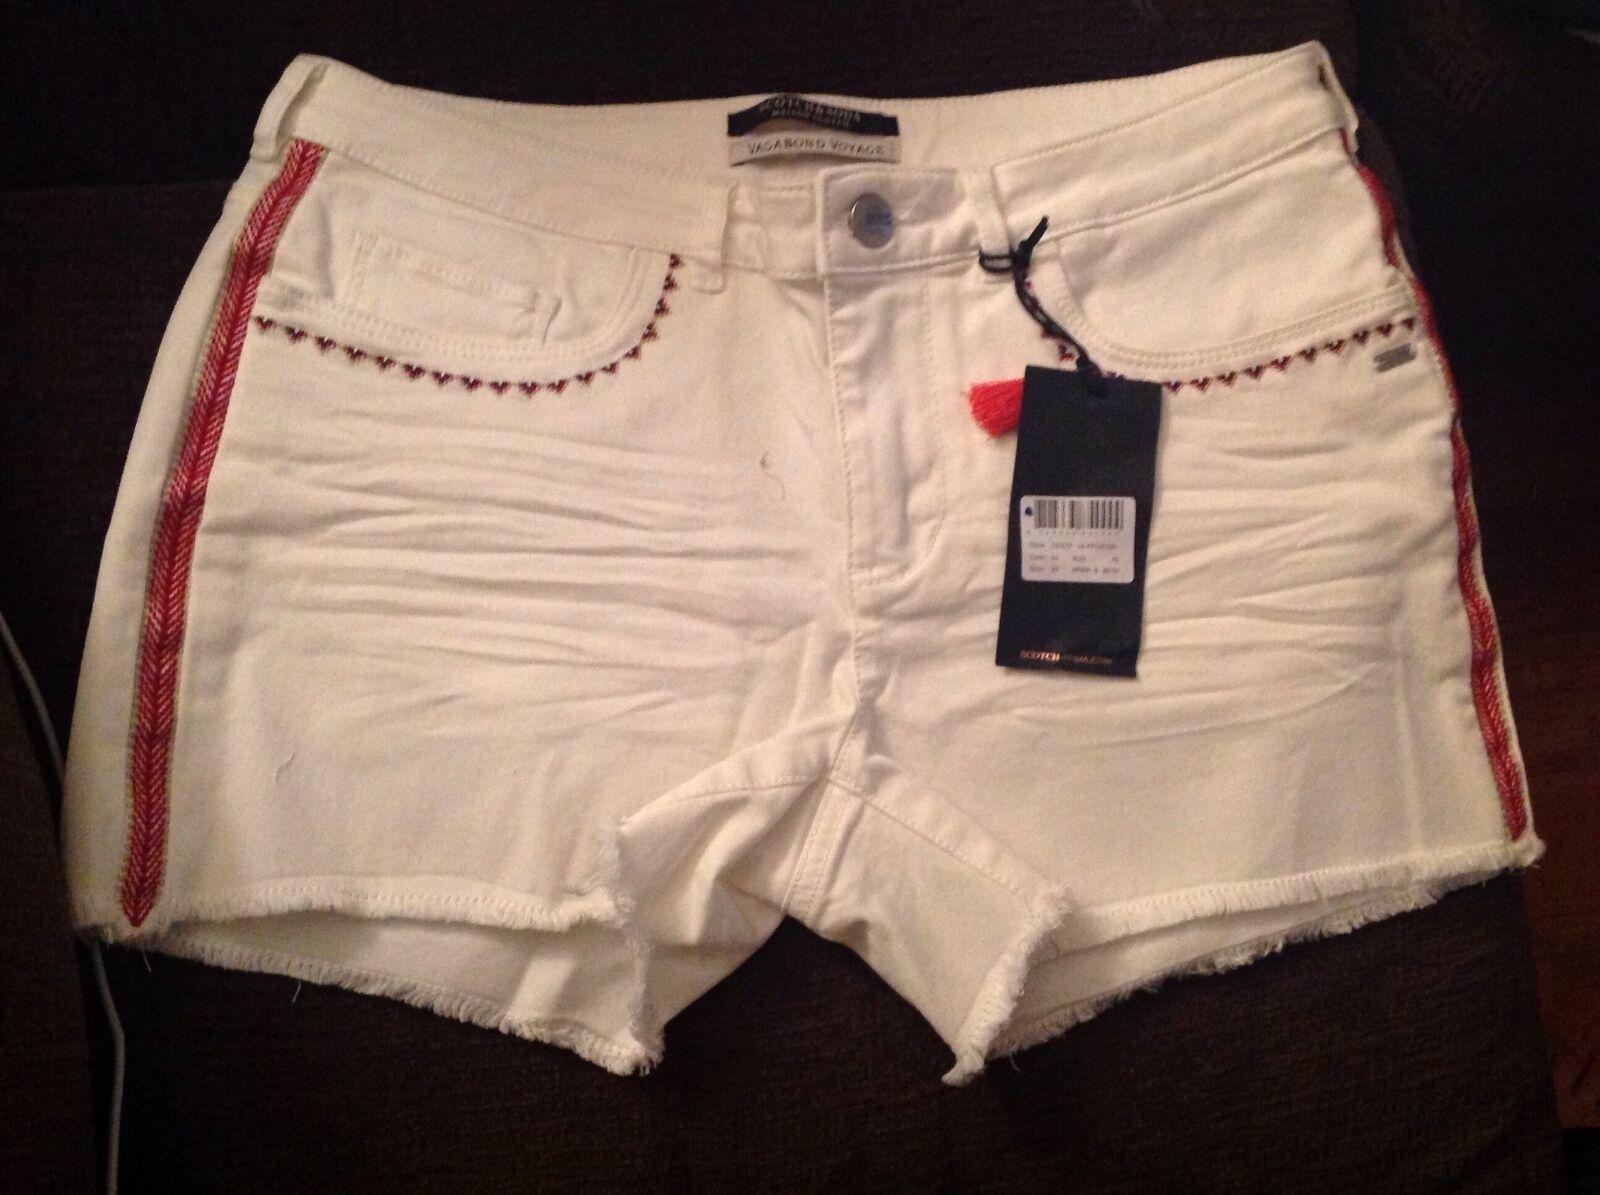 SCOTCH & SODA White Denim Shorts-Vagabond Voyage Collection, NWT,sz.29